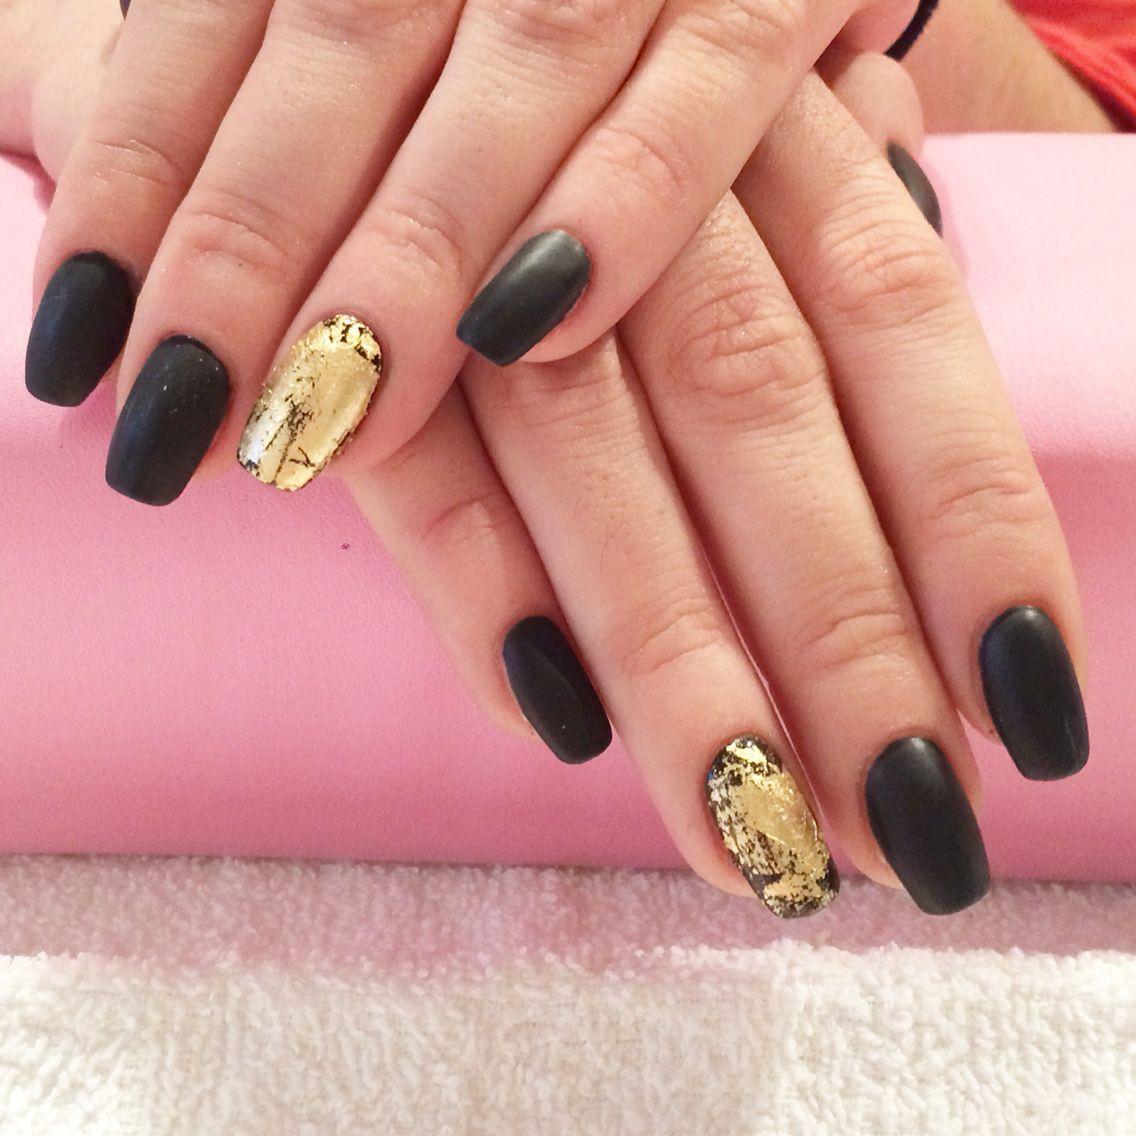 Pin de Rylee Harris en Nails <3 | Pinterest